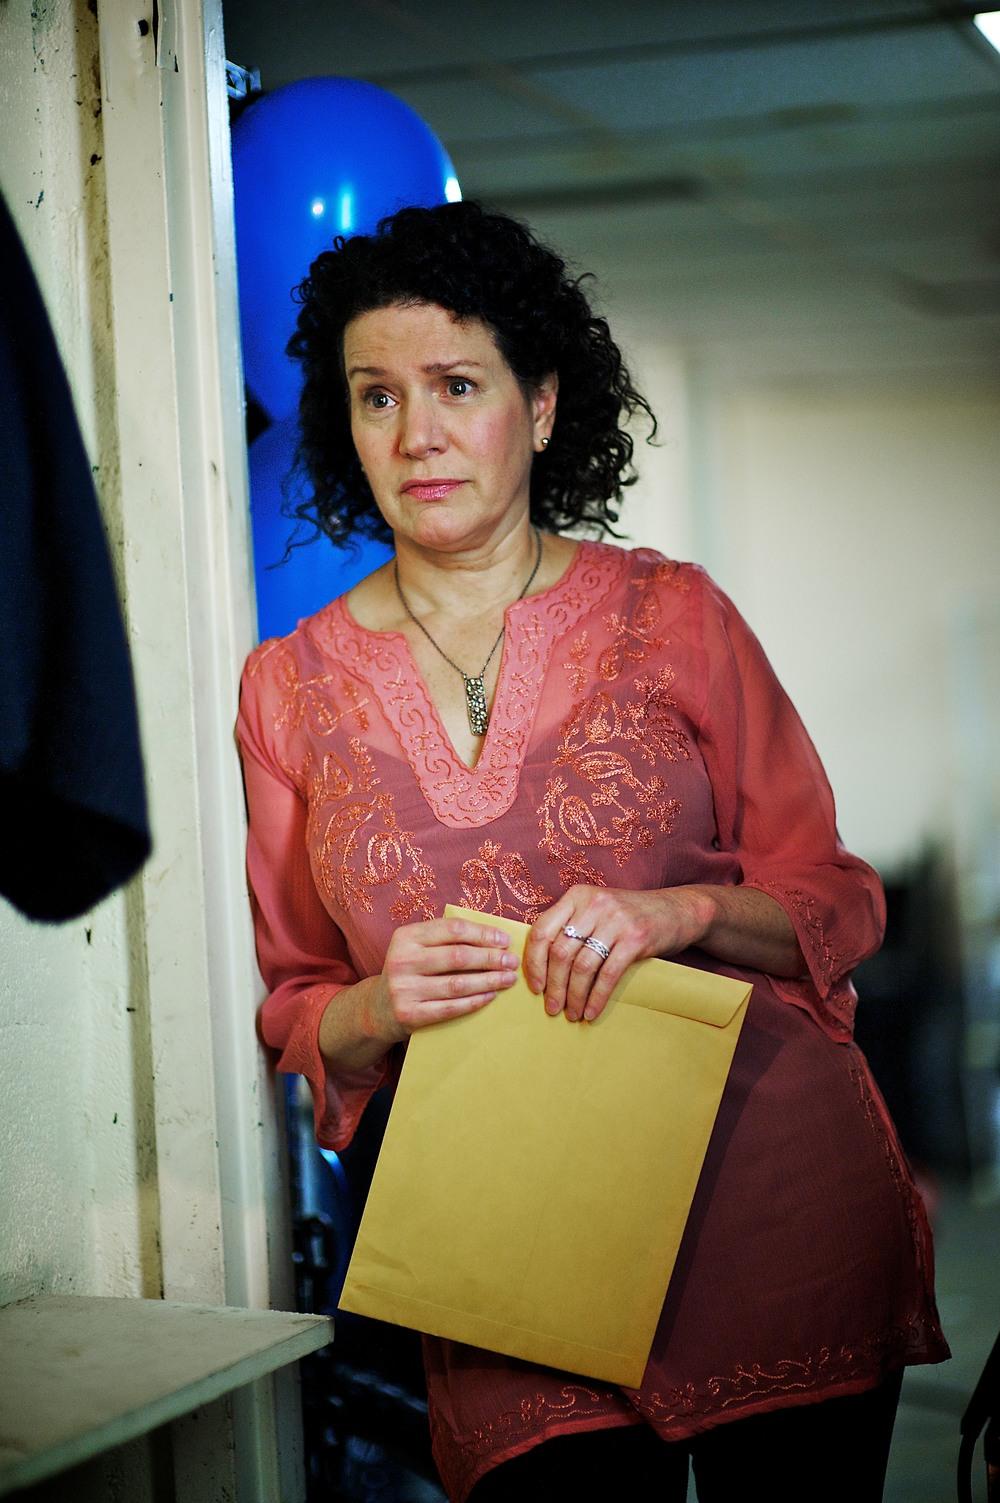 Susie Essman as Gilda